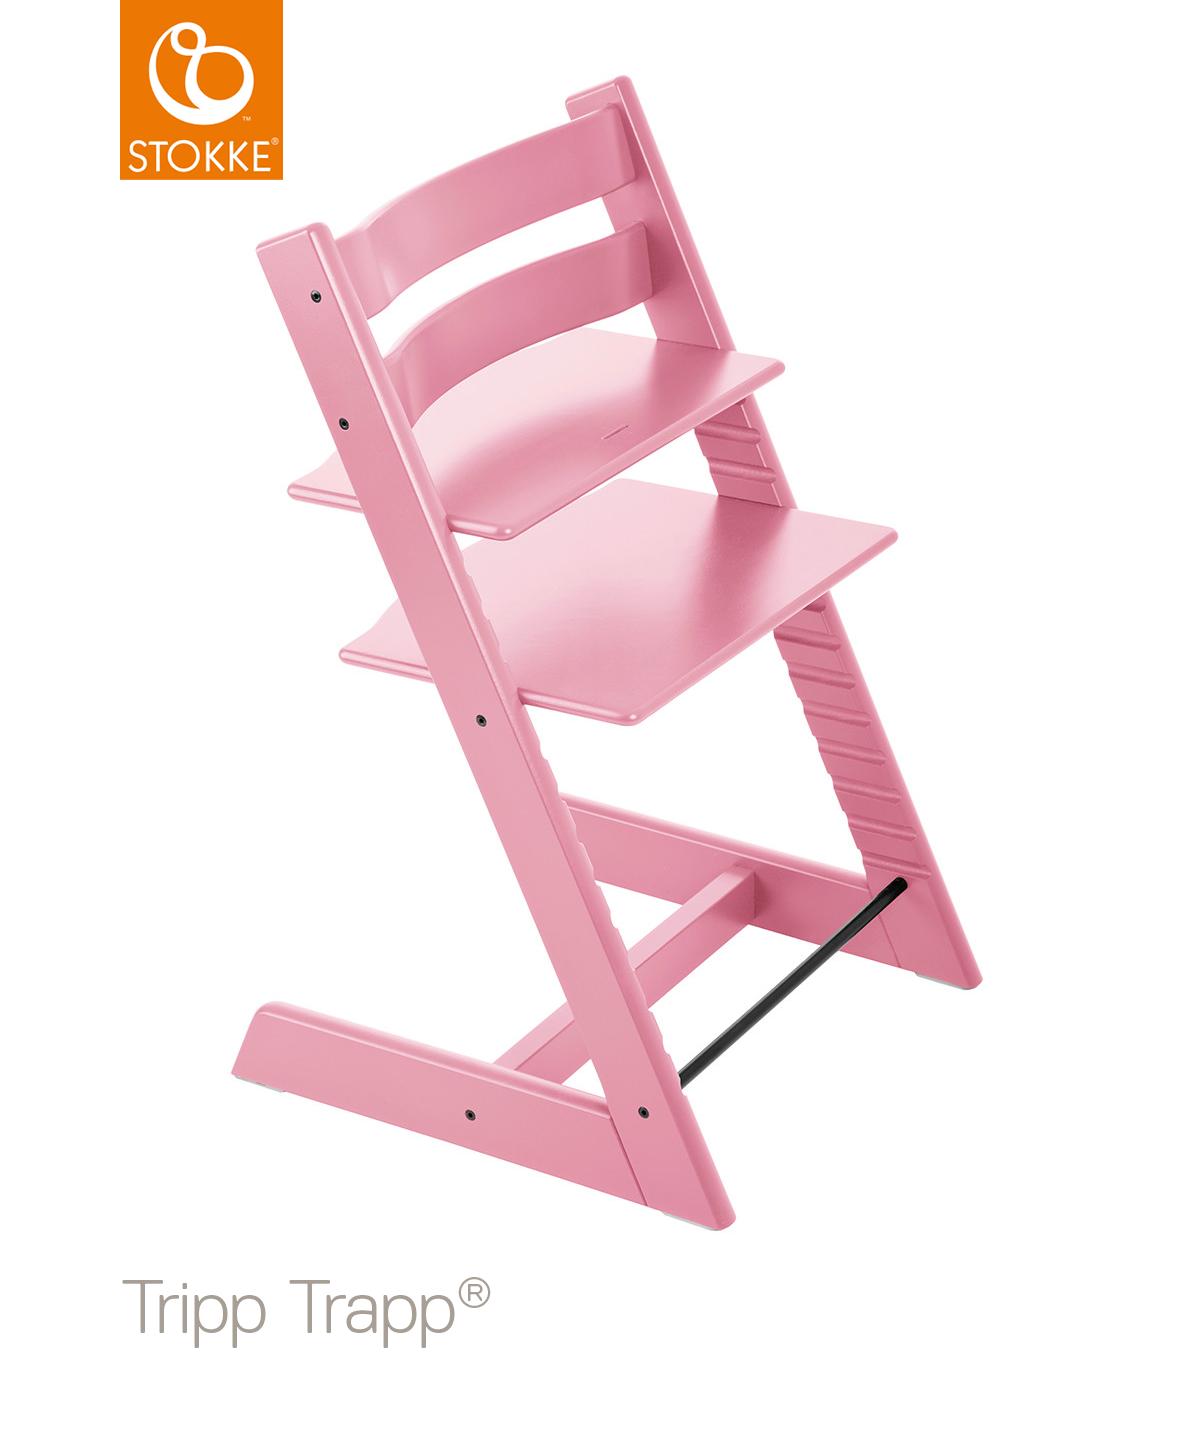 Stokke Tripp Trapp Barnstol - Rosa